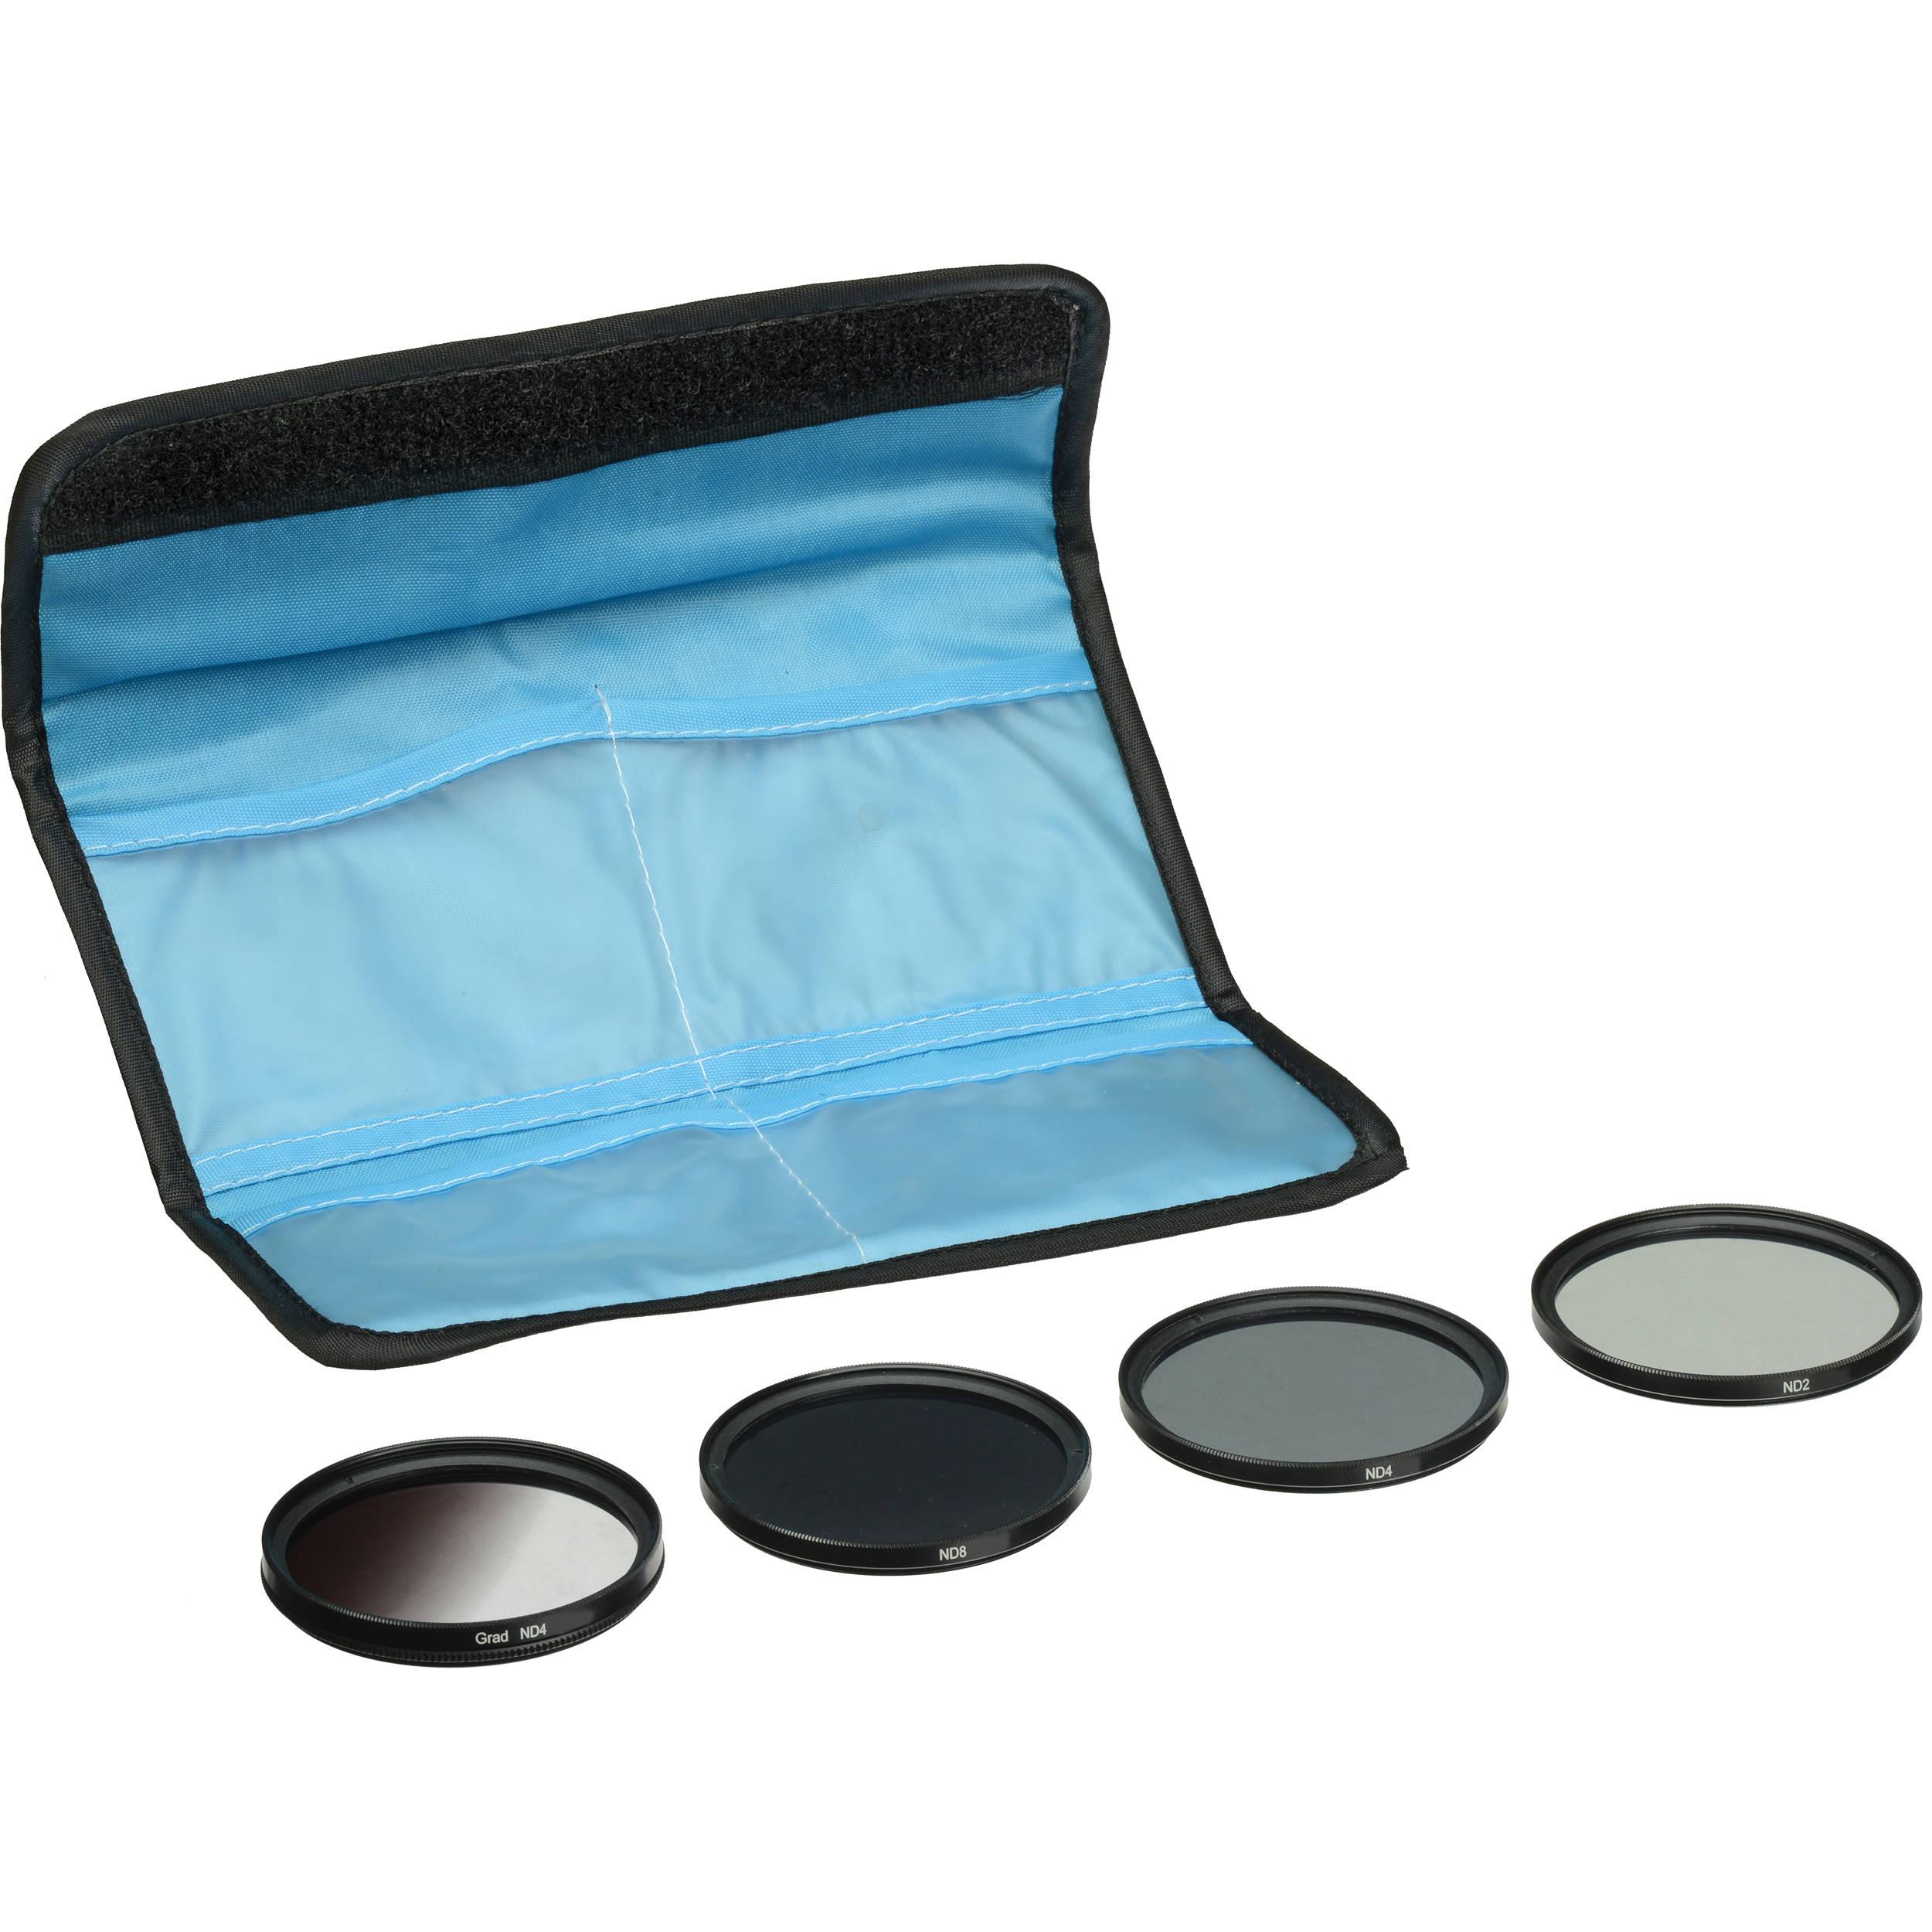 General Brand 58mm 5 Piece Neutral Density Filter Kit